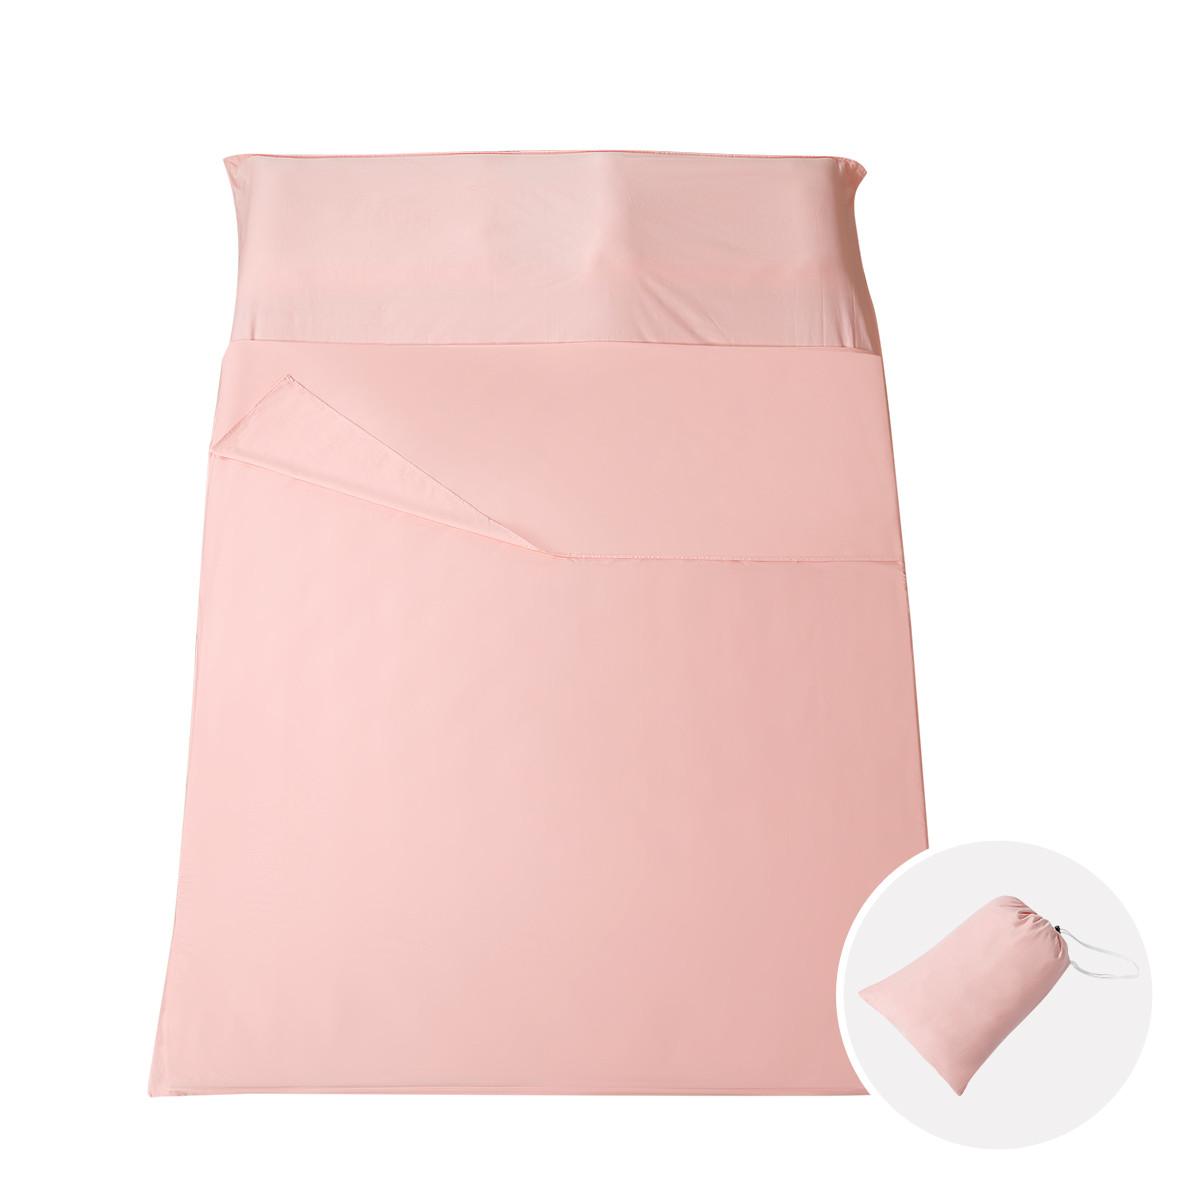 Ramada【年底清仓】全棉隔脏睡袋被单旅行床单旅行酒店隔脏睡袋纯棉COLOR粉色